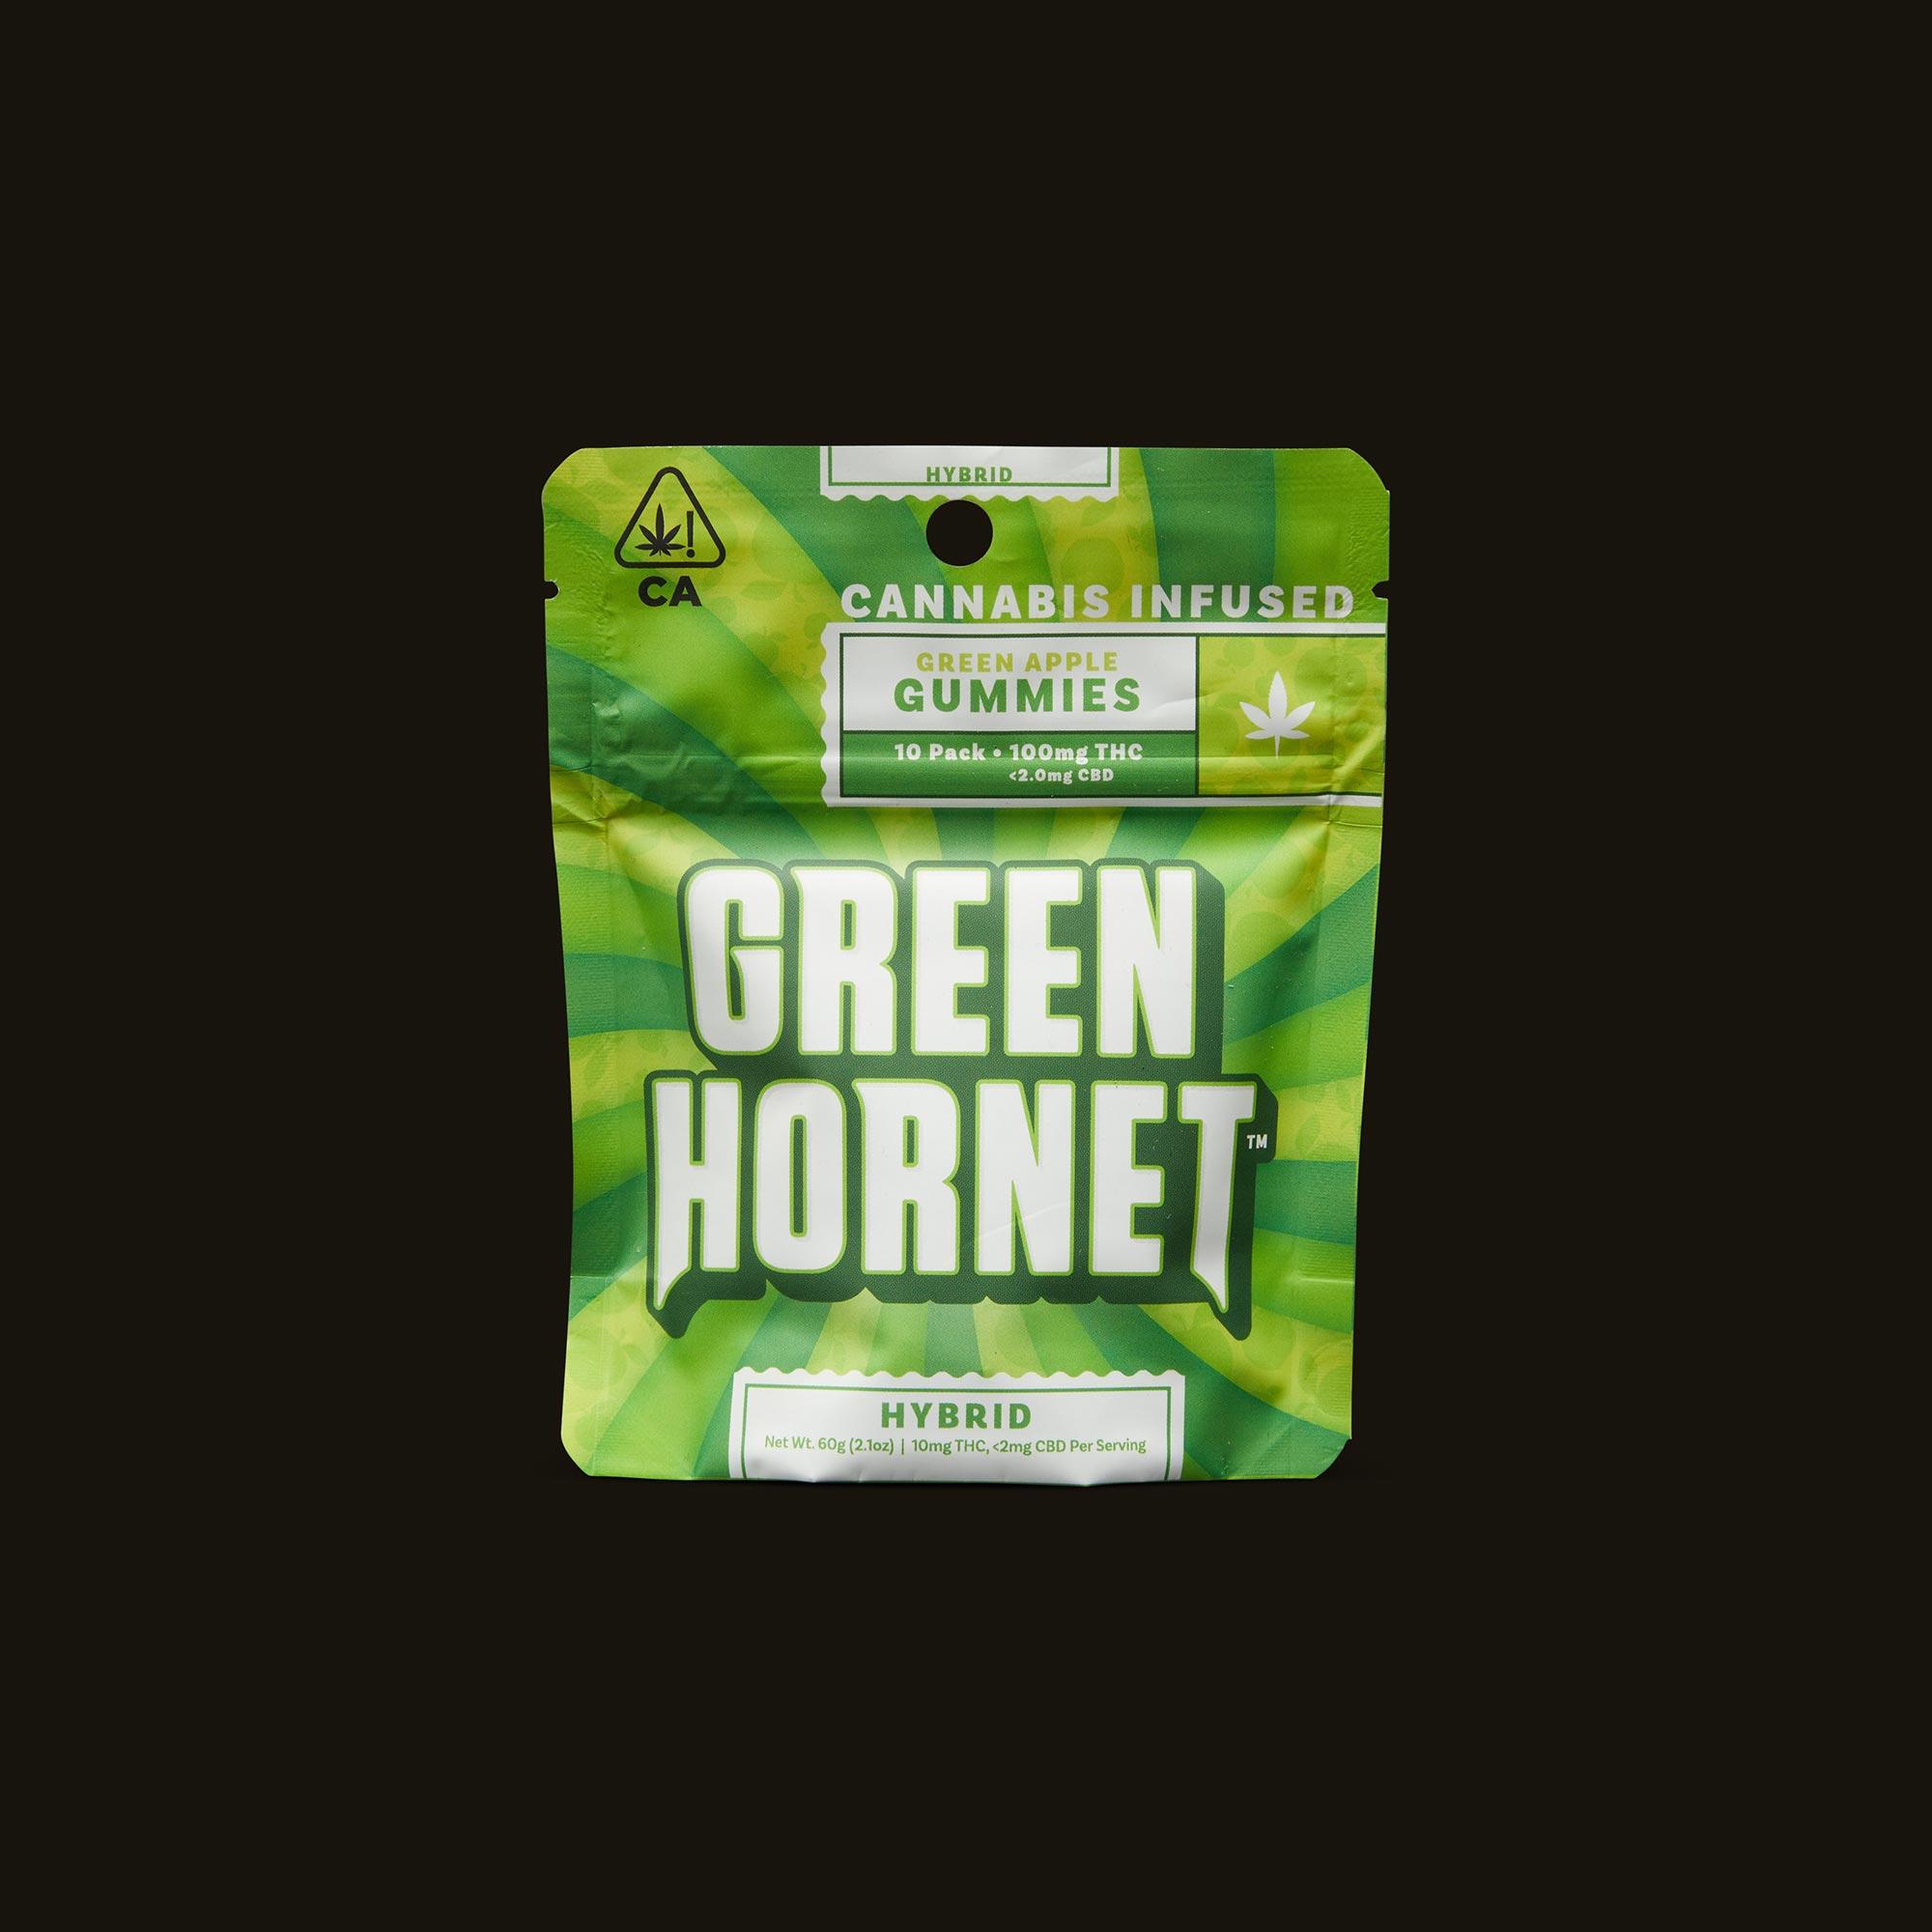 Green Hornet Hybrid Green Apple Gummies Front Packaging